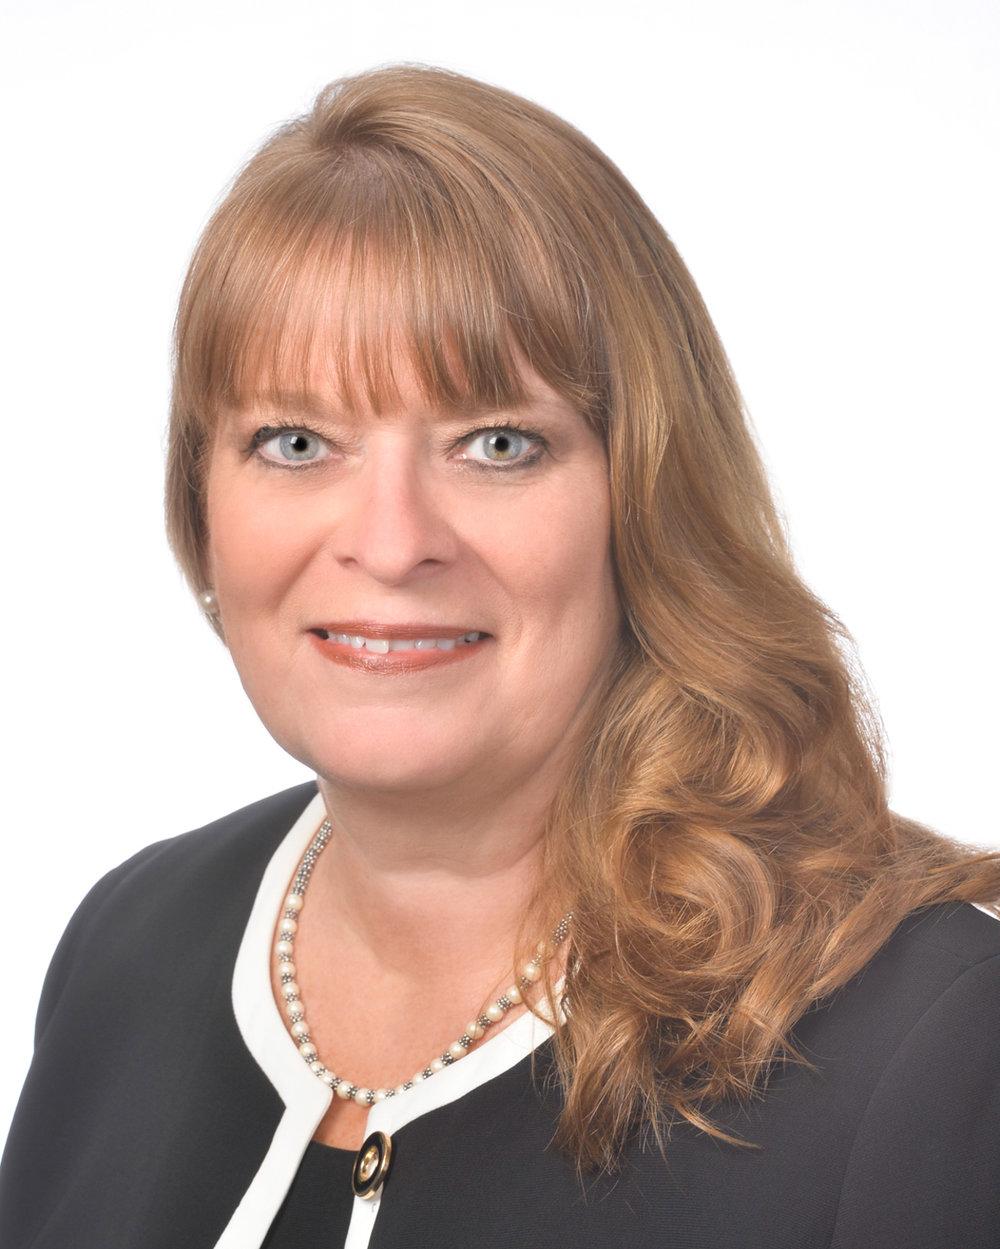 Tammy L. Ortman - Director